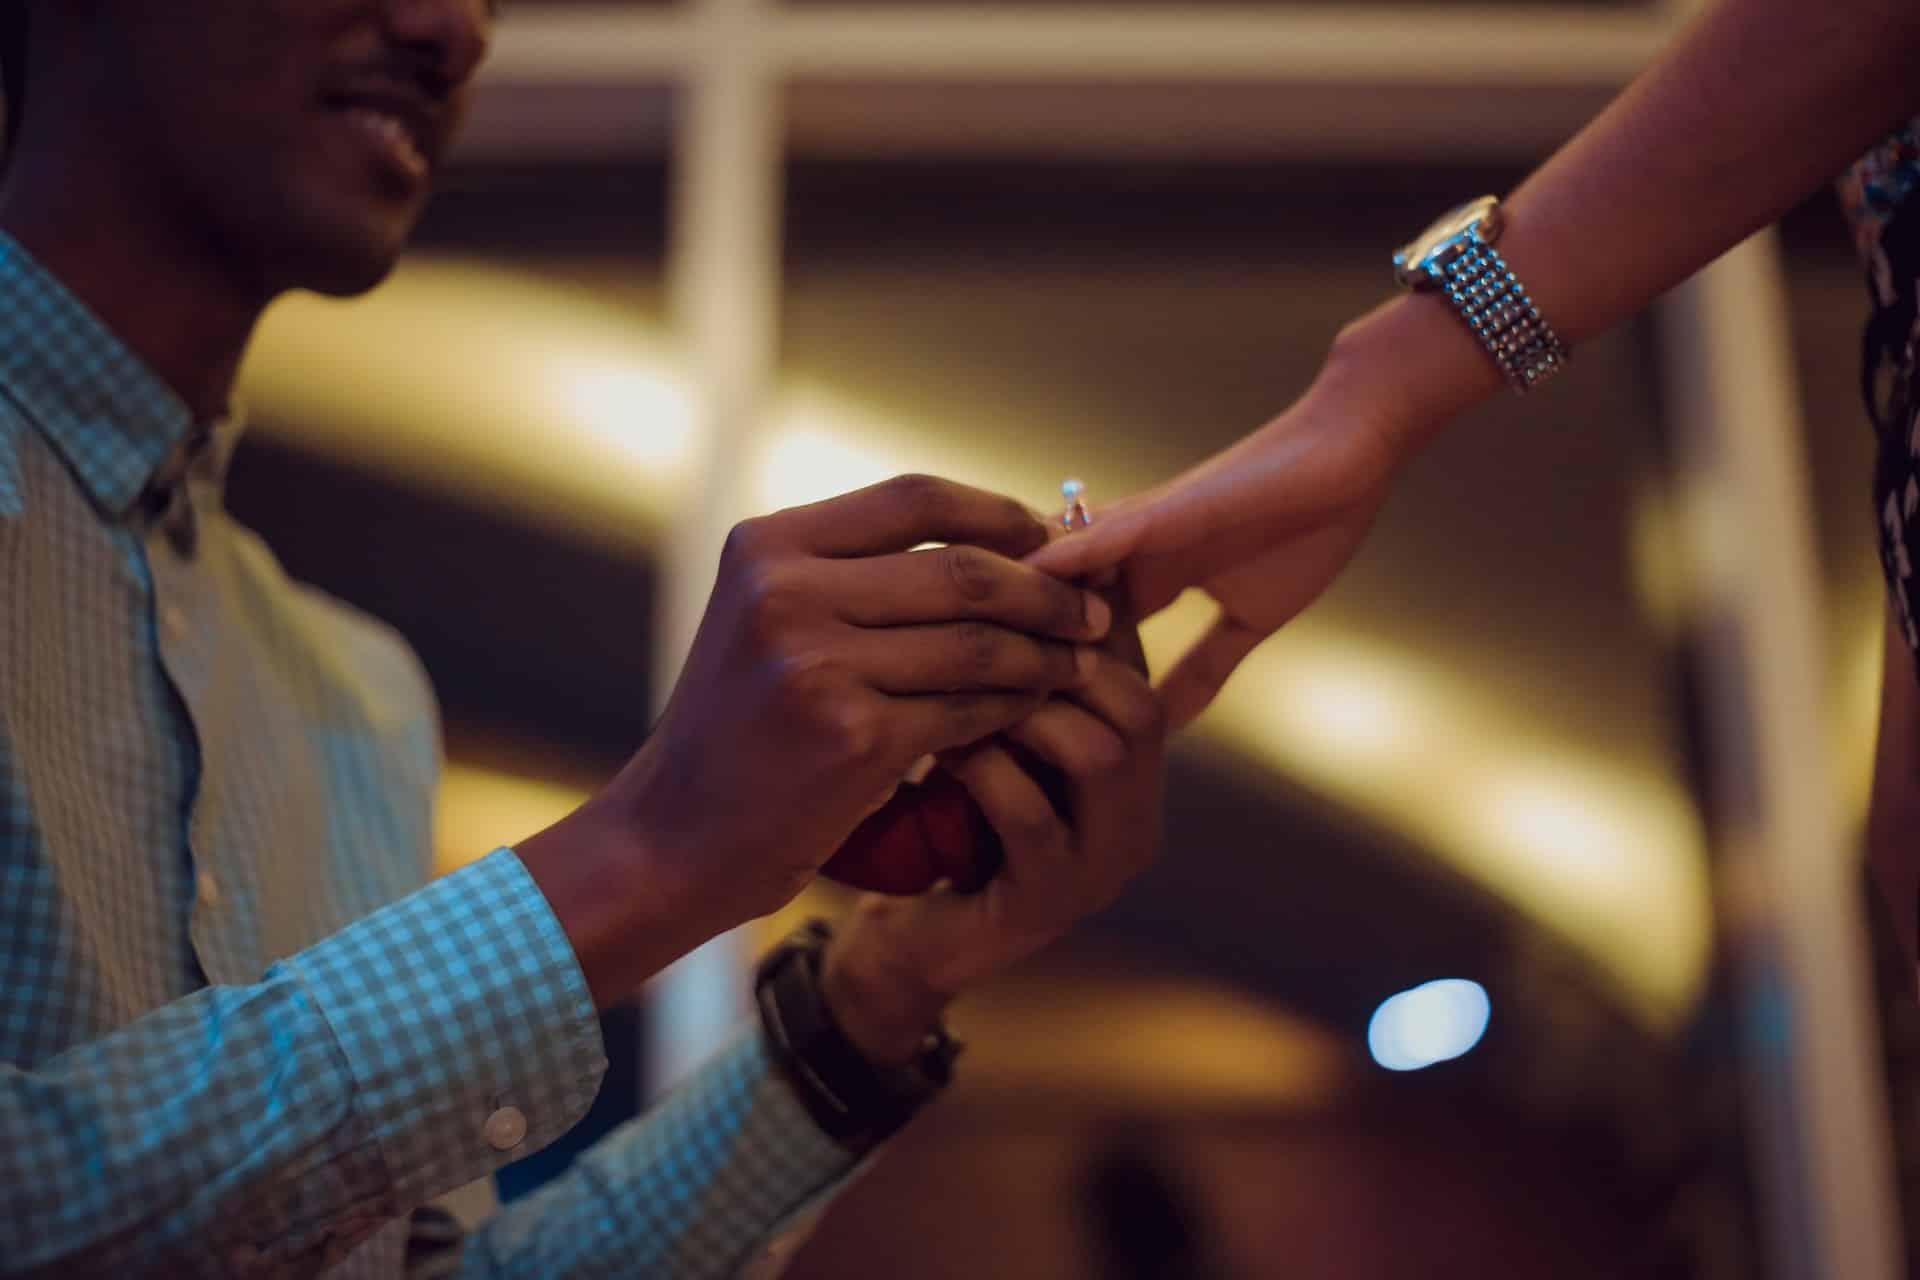 Engagement Ring Trends 2021 Header Image